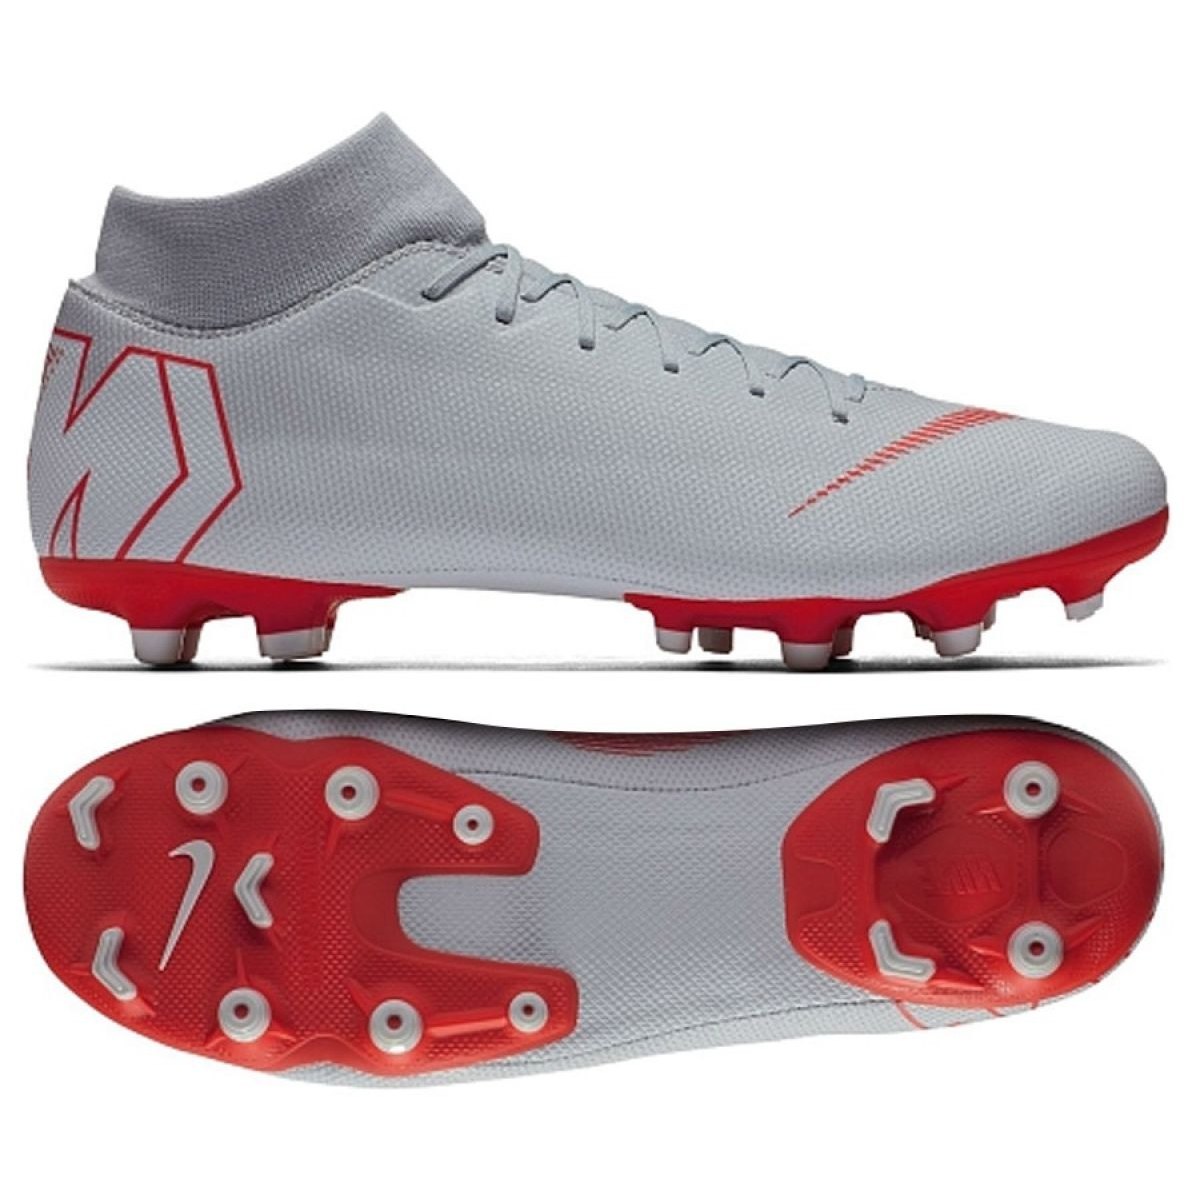 Botas de futebol Nike Mercurial Superfly 6 Academia Mg M AH7362 060 cinza prata prata